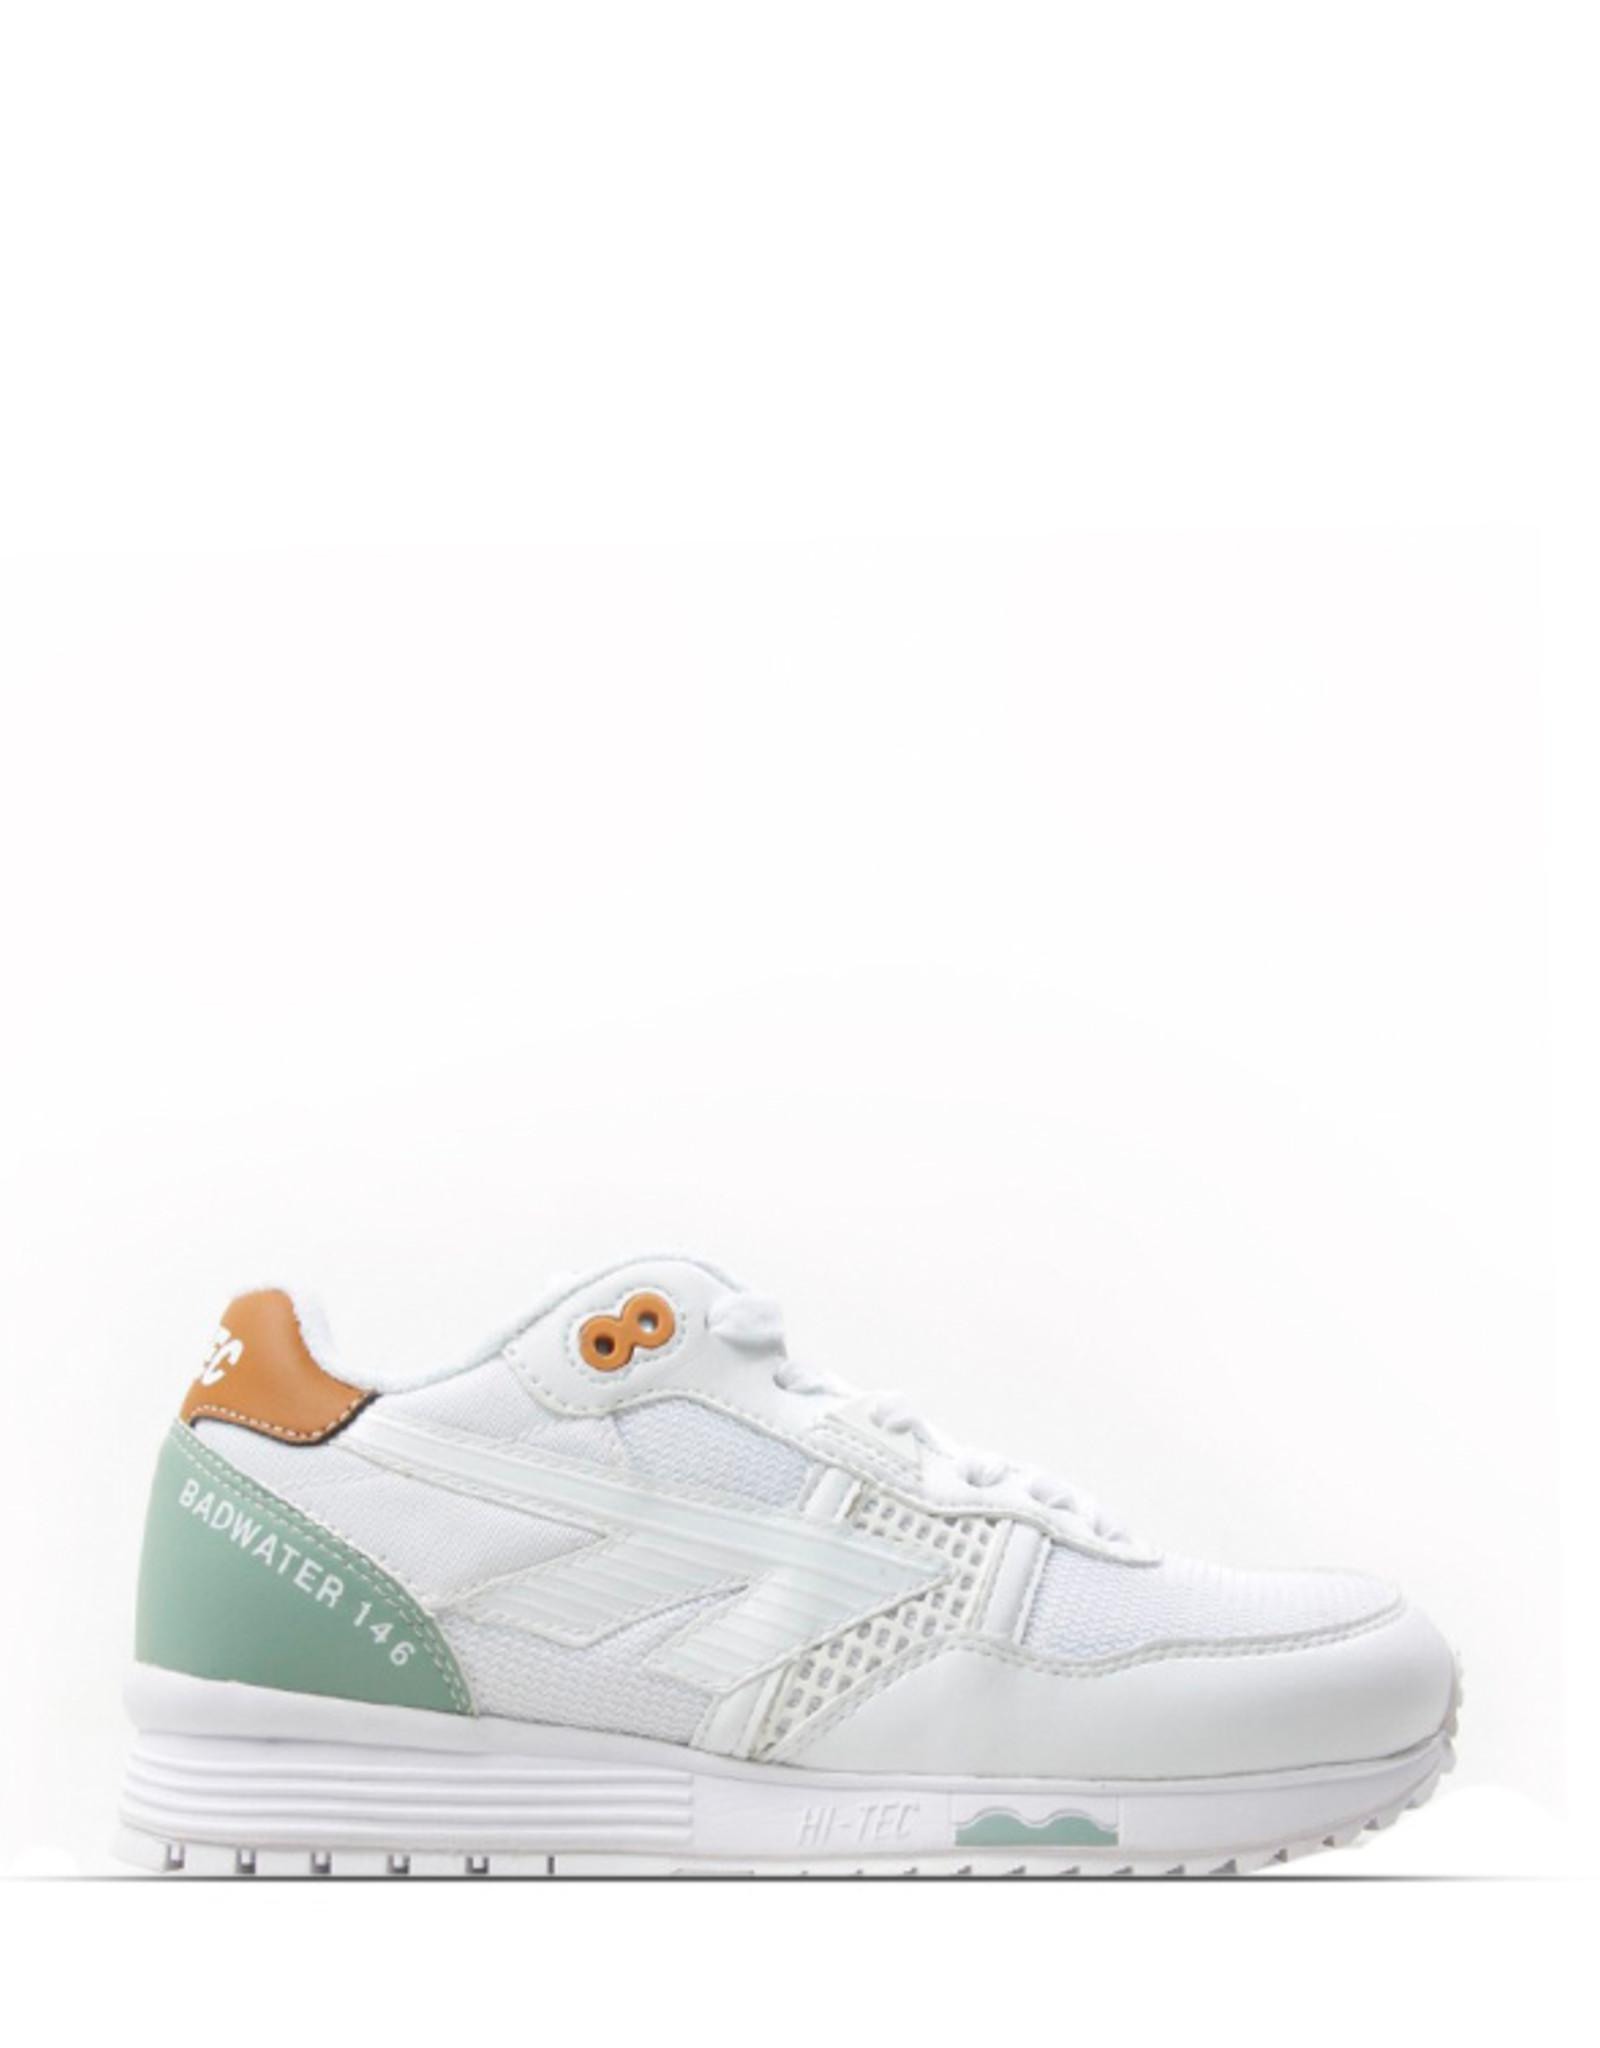 HI-TEC BW 146 UNISEX WHITE SAGE/GREEN GUM